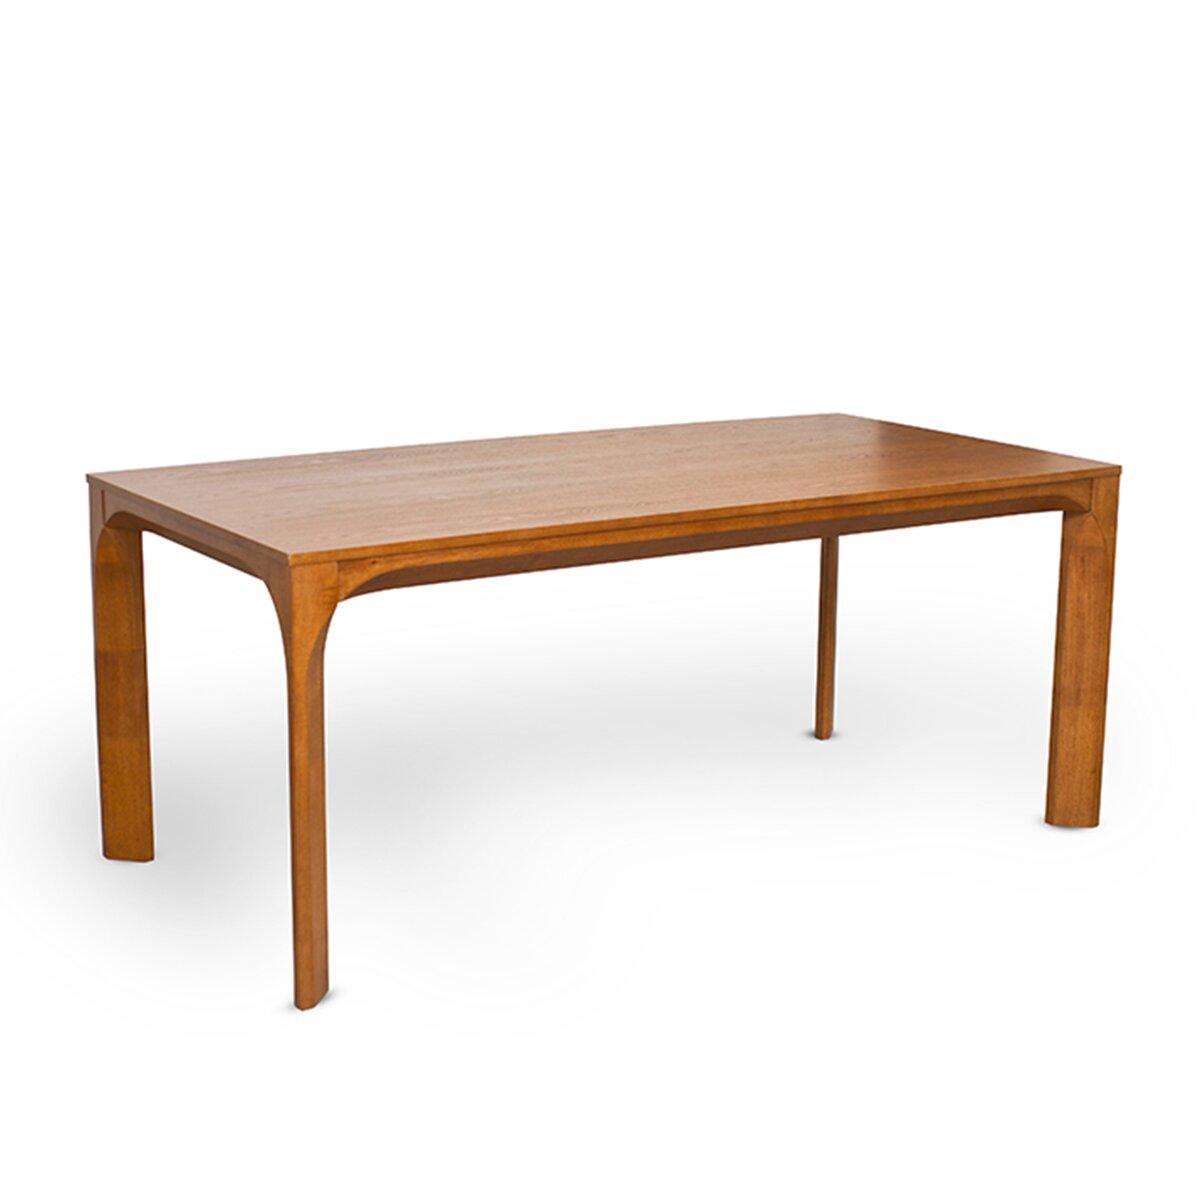 Furniture Importers: Wholesale Furniture Imports Lenox 7 Piece Dining Set